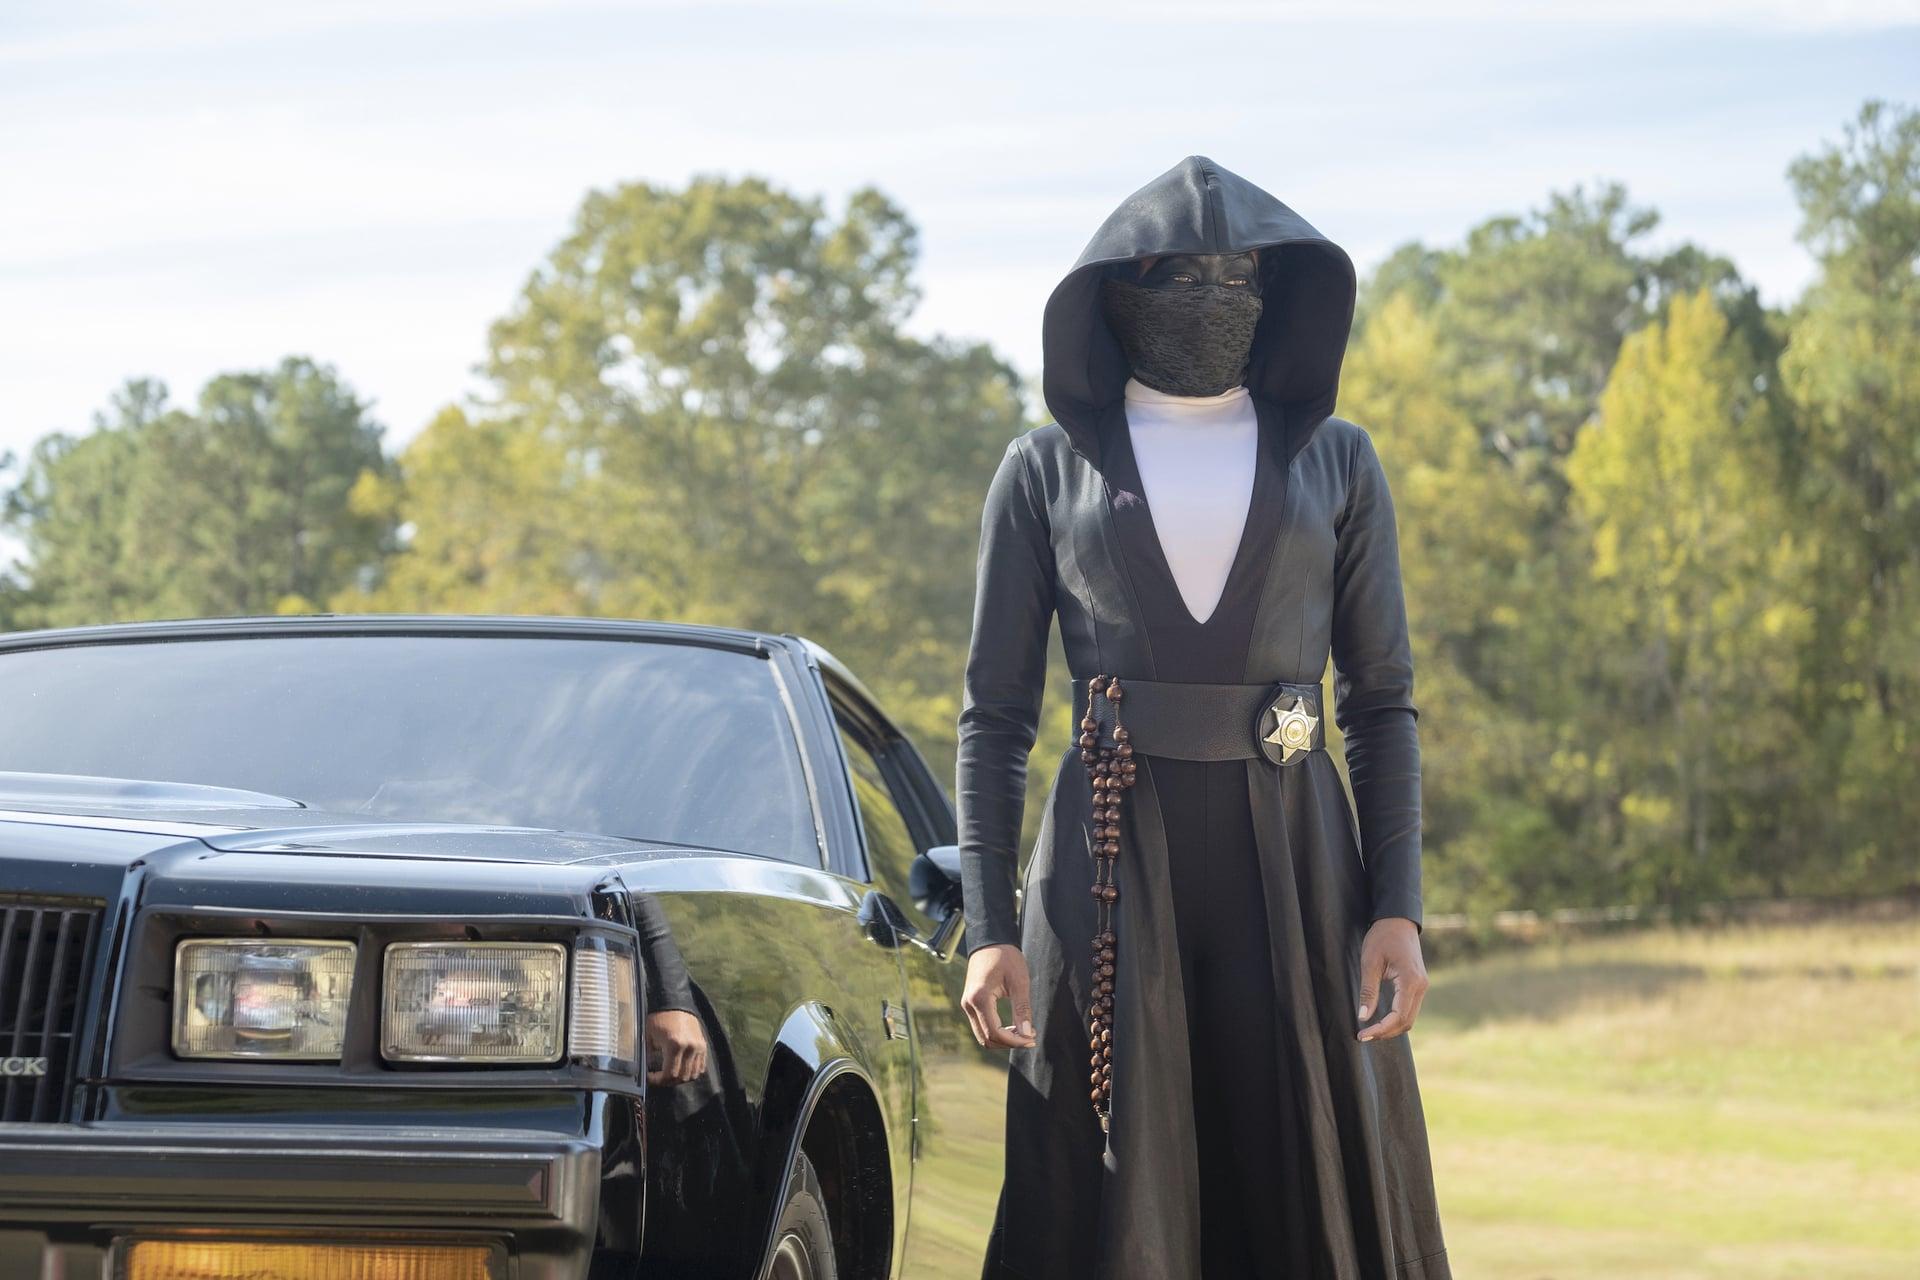 The Best Halloween Costume Ideas For 2020 Popsugar Smart Living